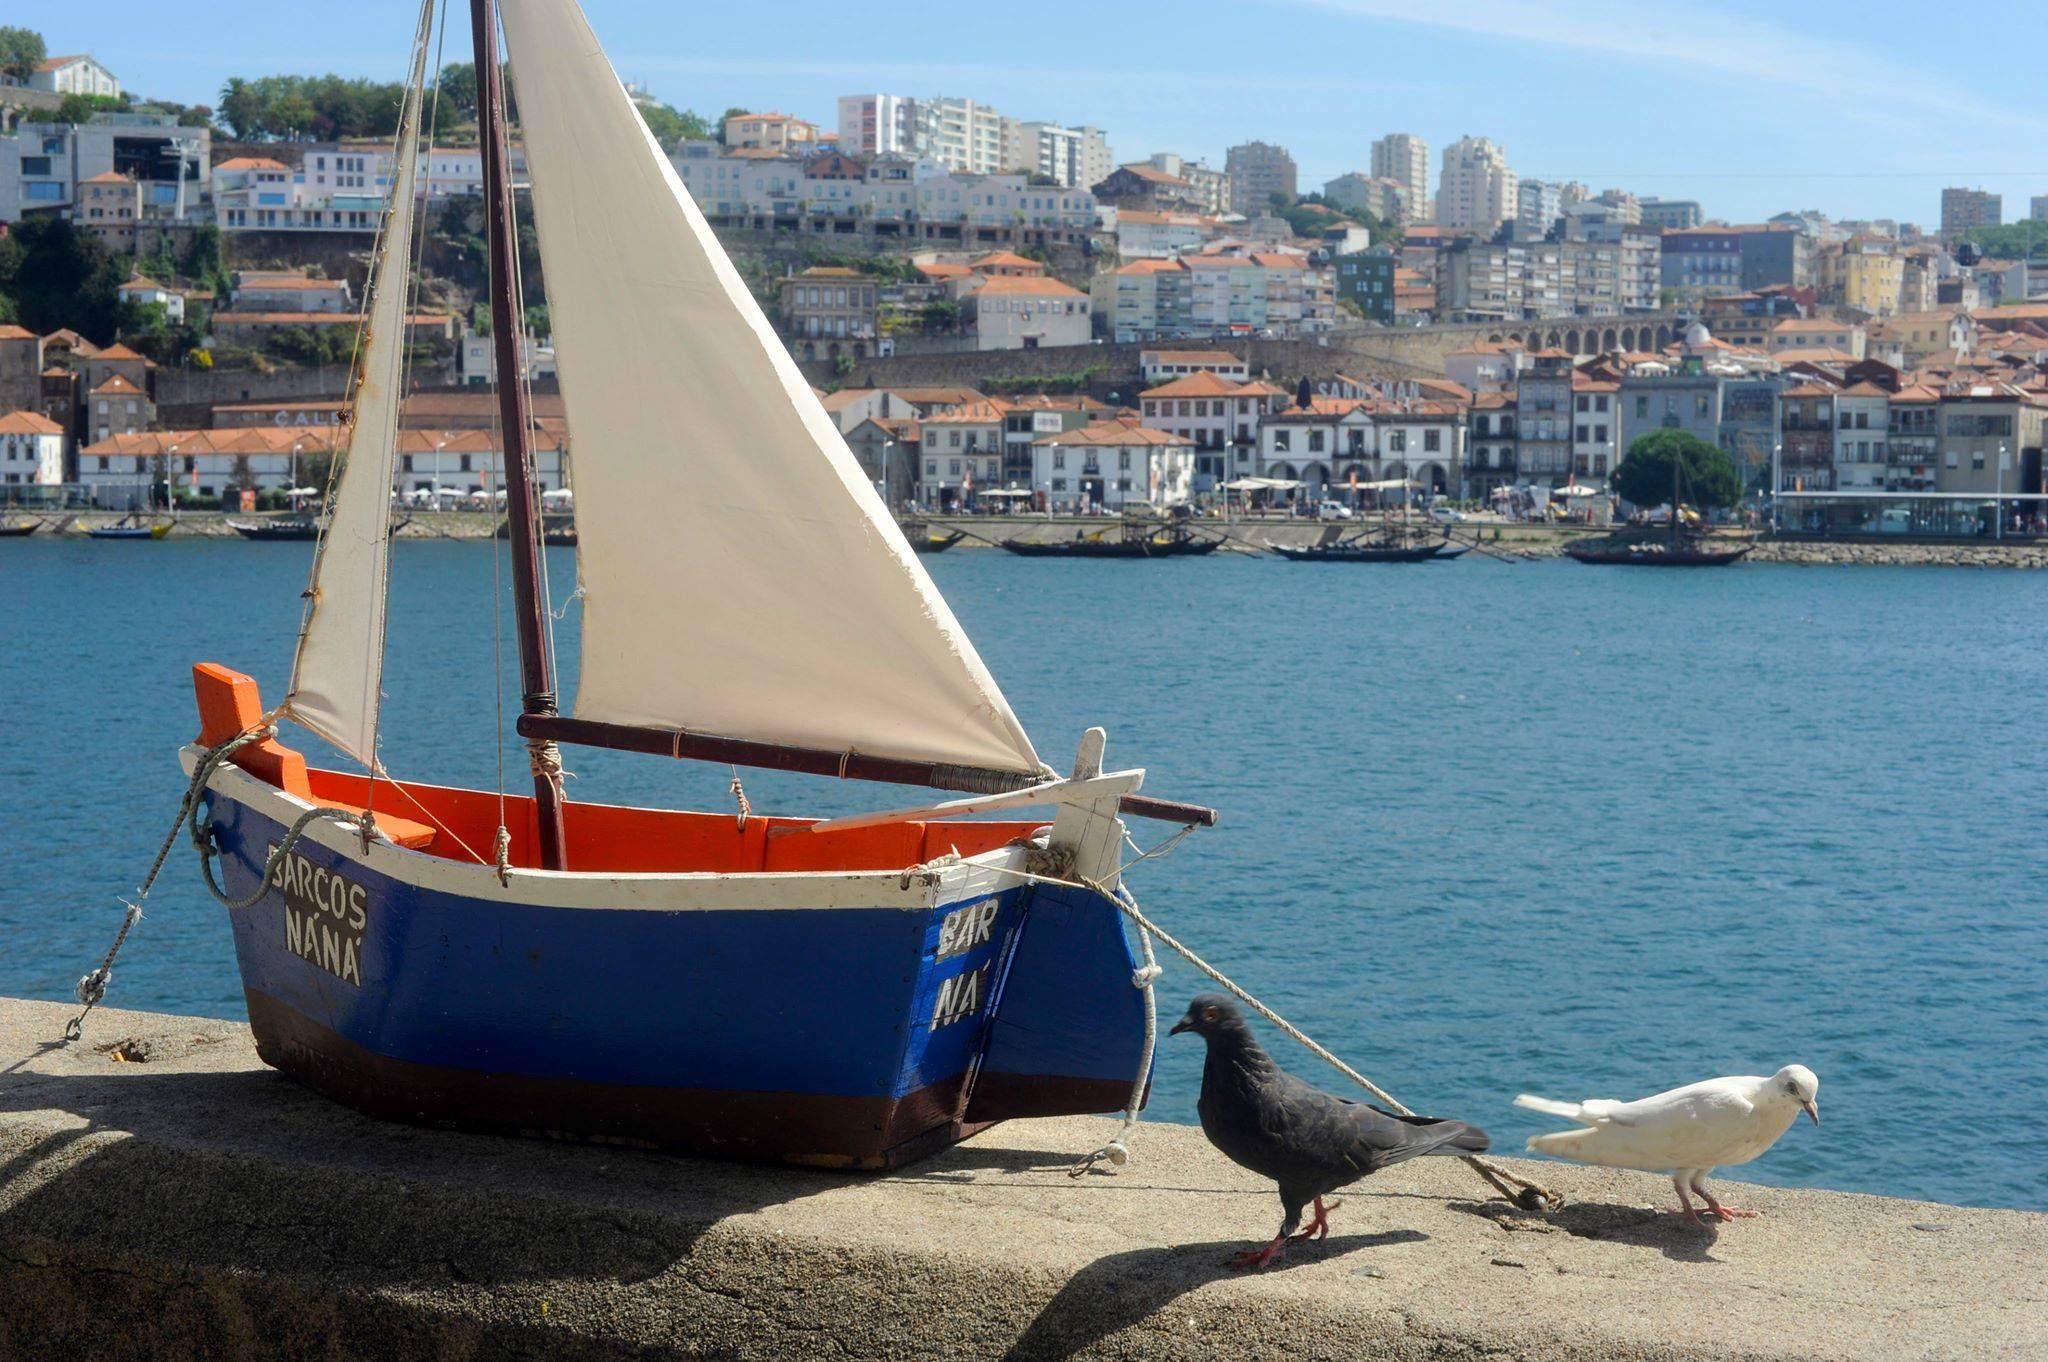 Boat-pigeons-Barcos-Nana.jpg